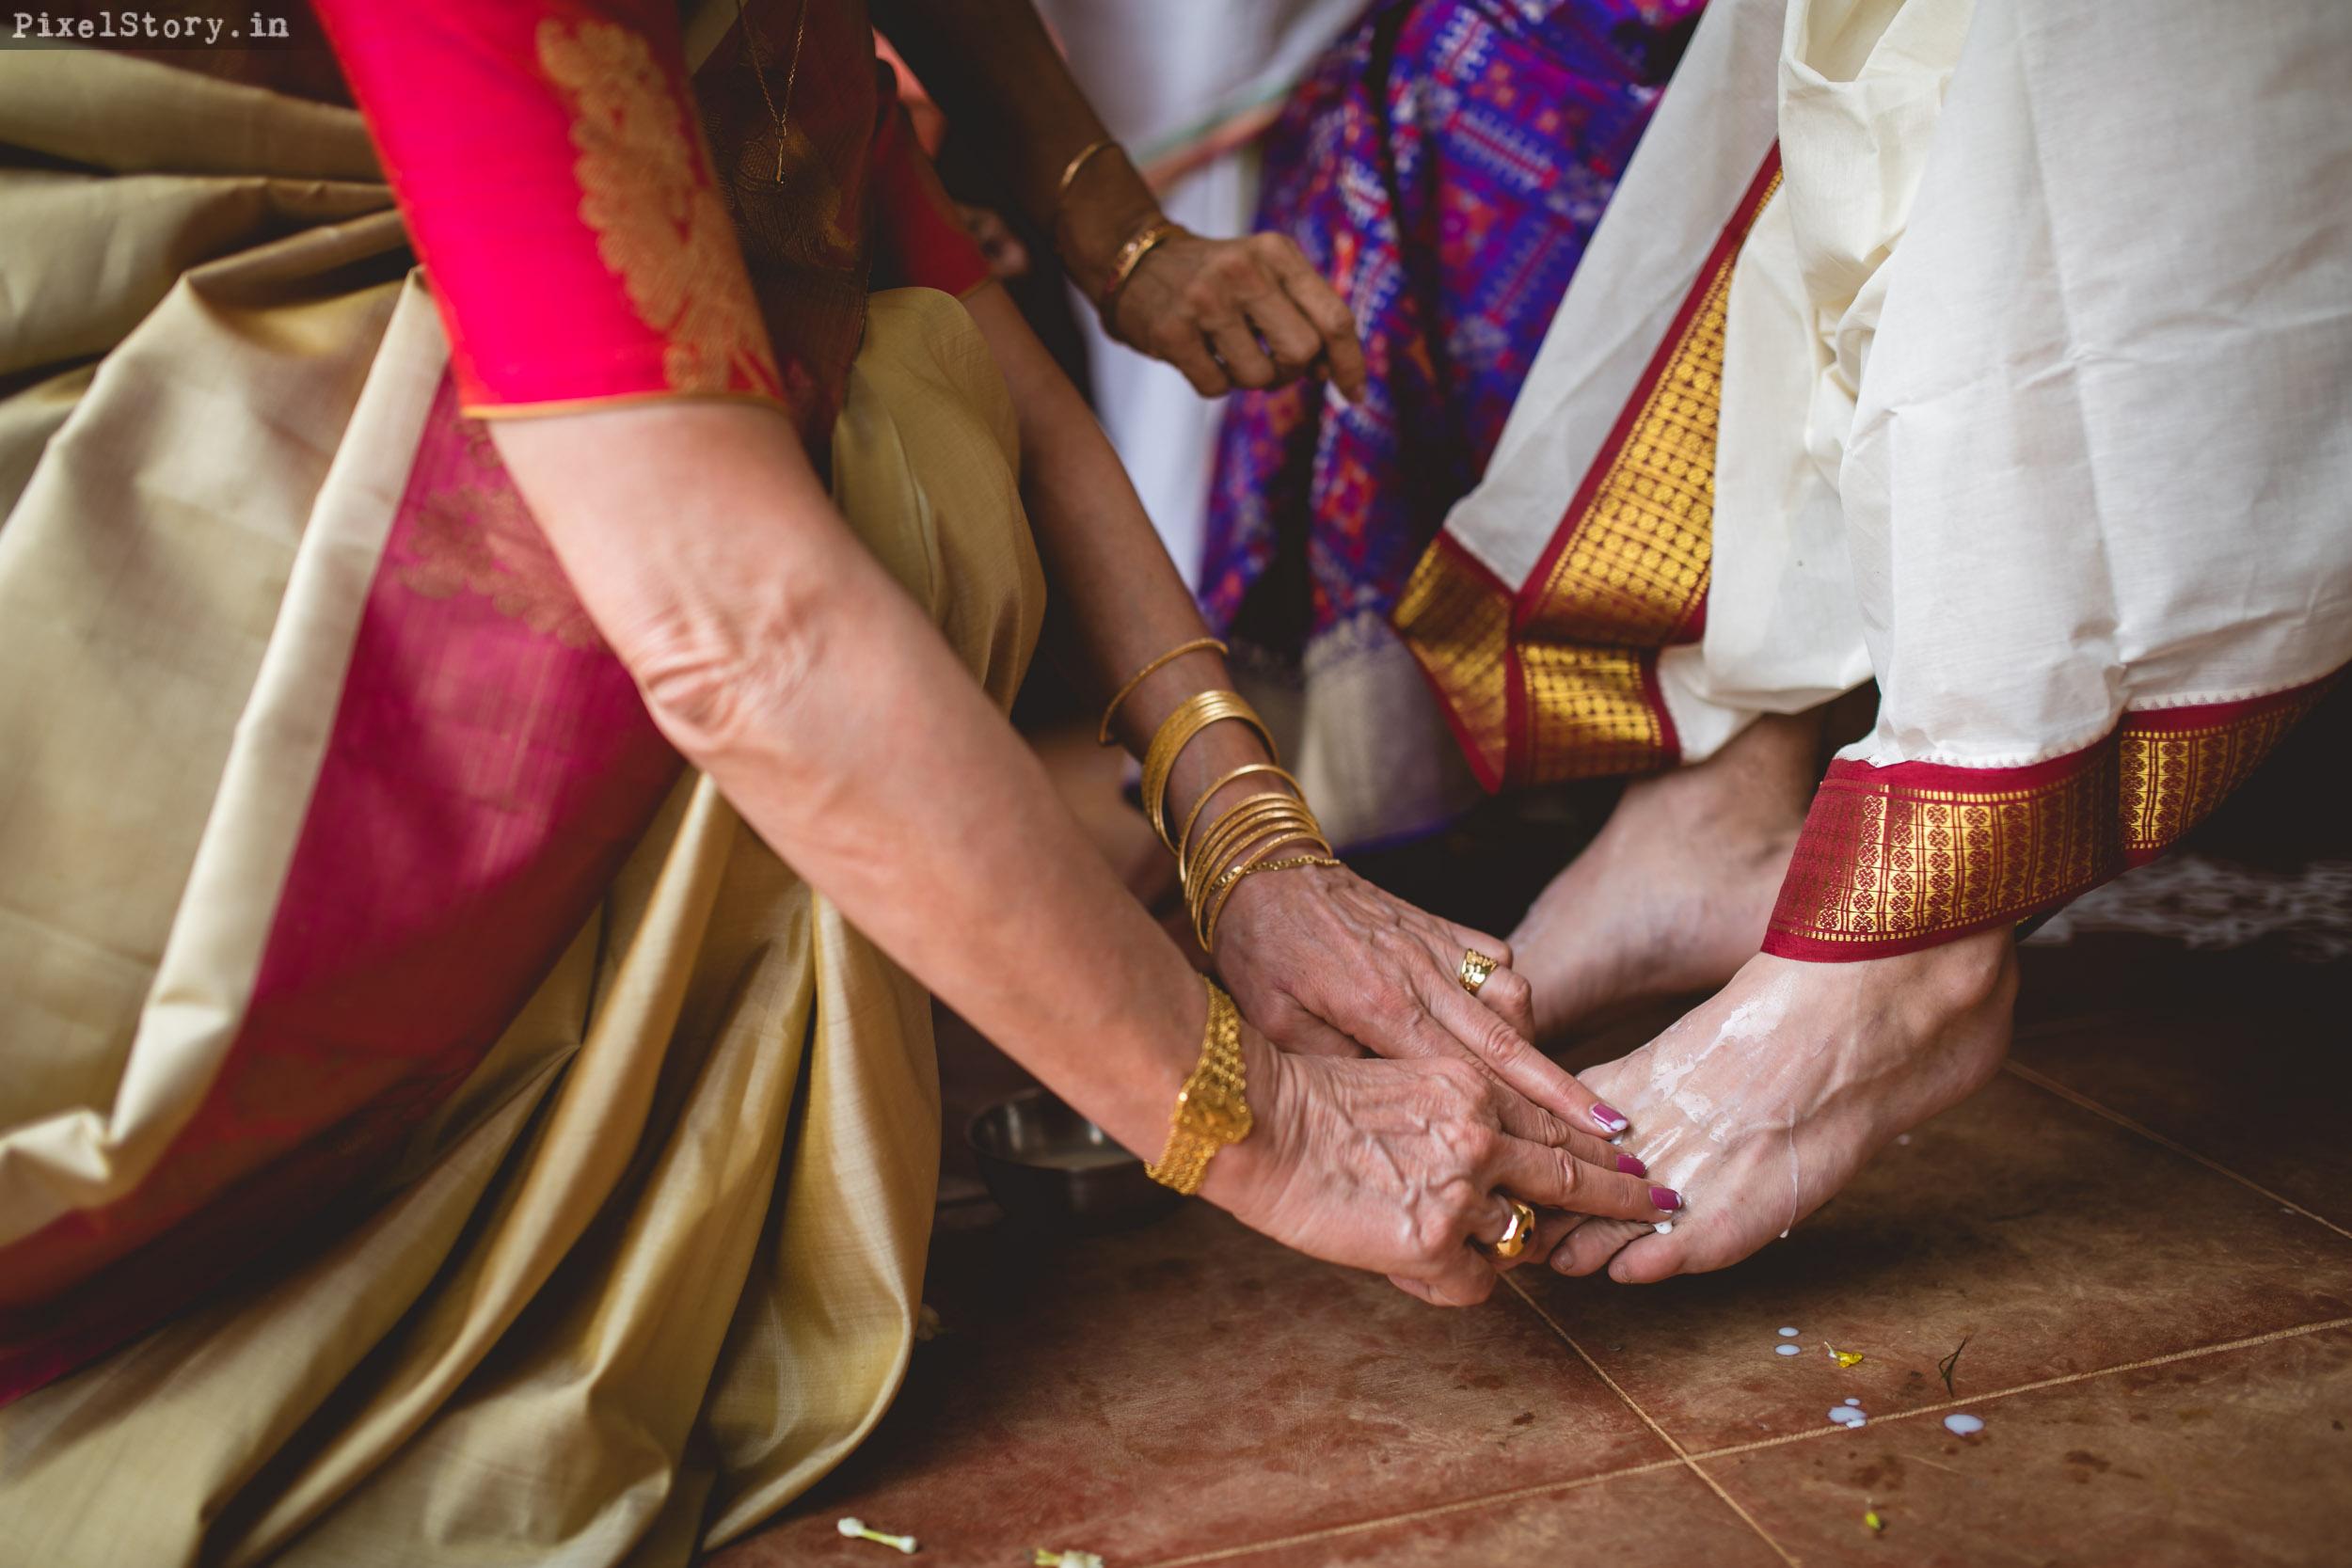 PixelStory-Jungle-Wedding-Photographer-Masinagudi-Indo-French035.jpg